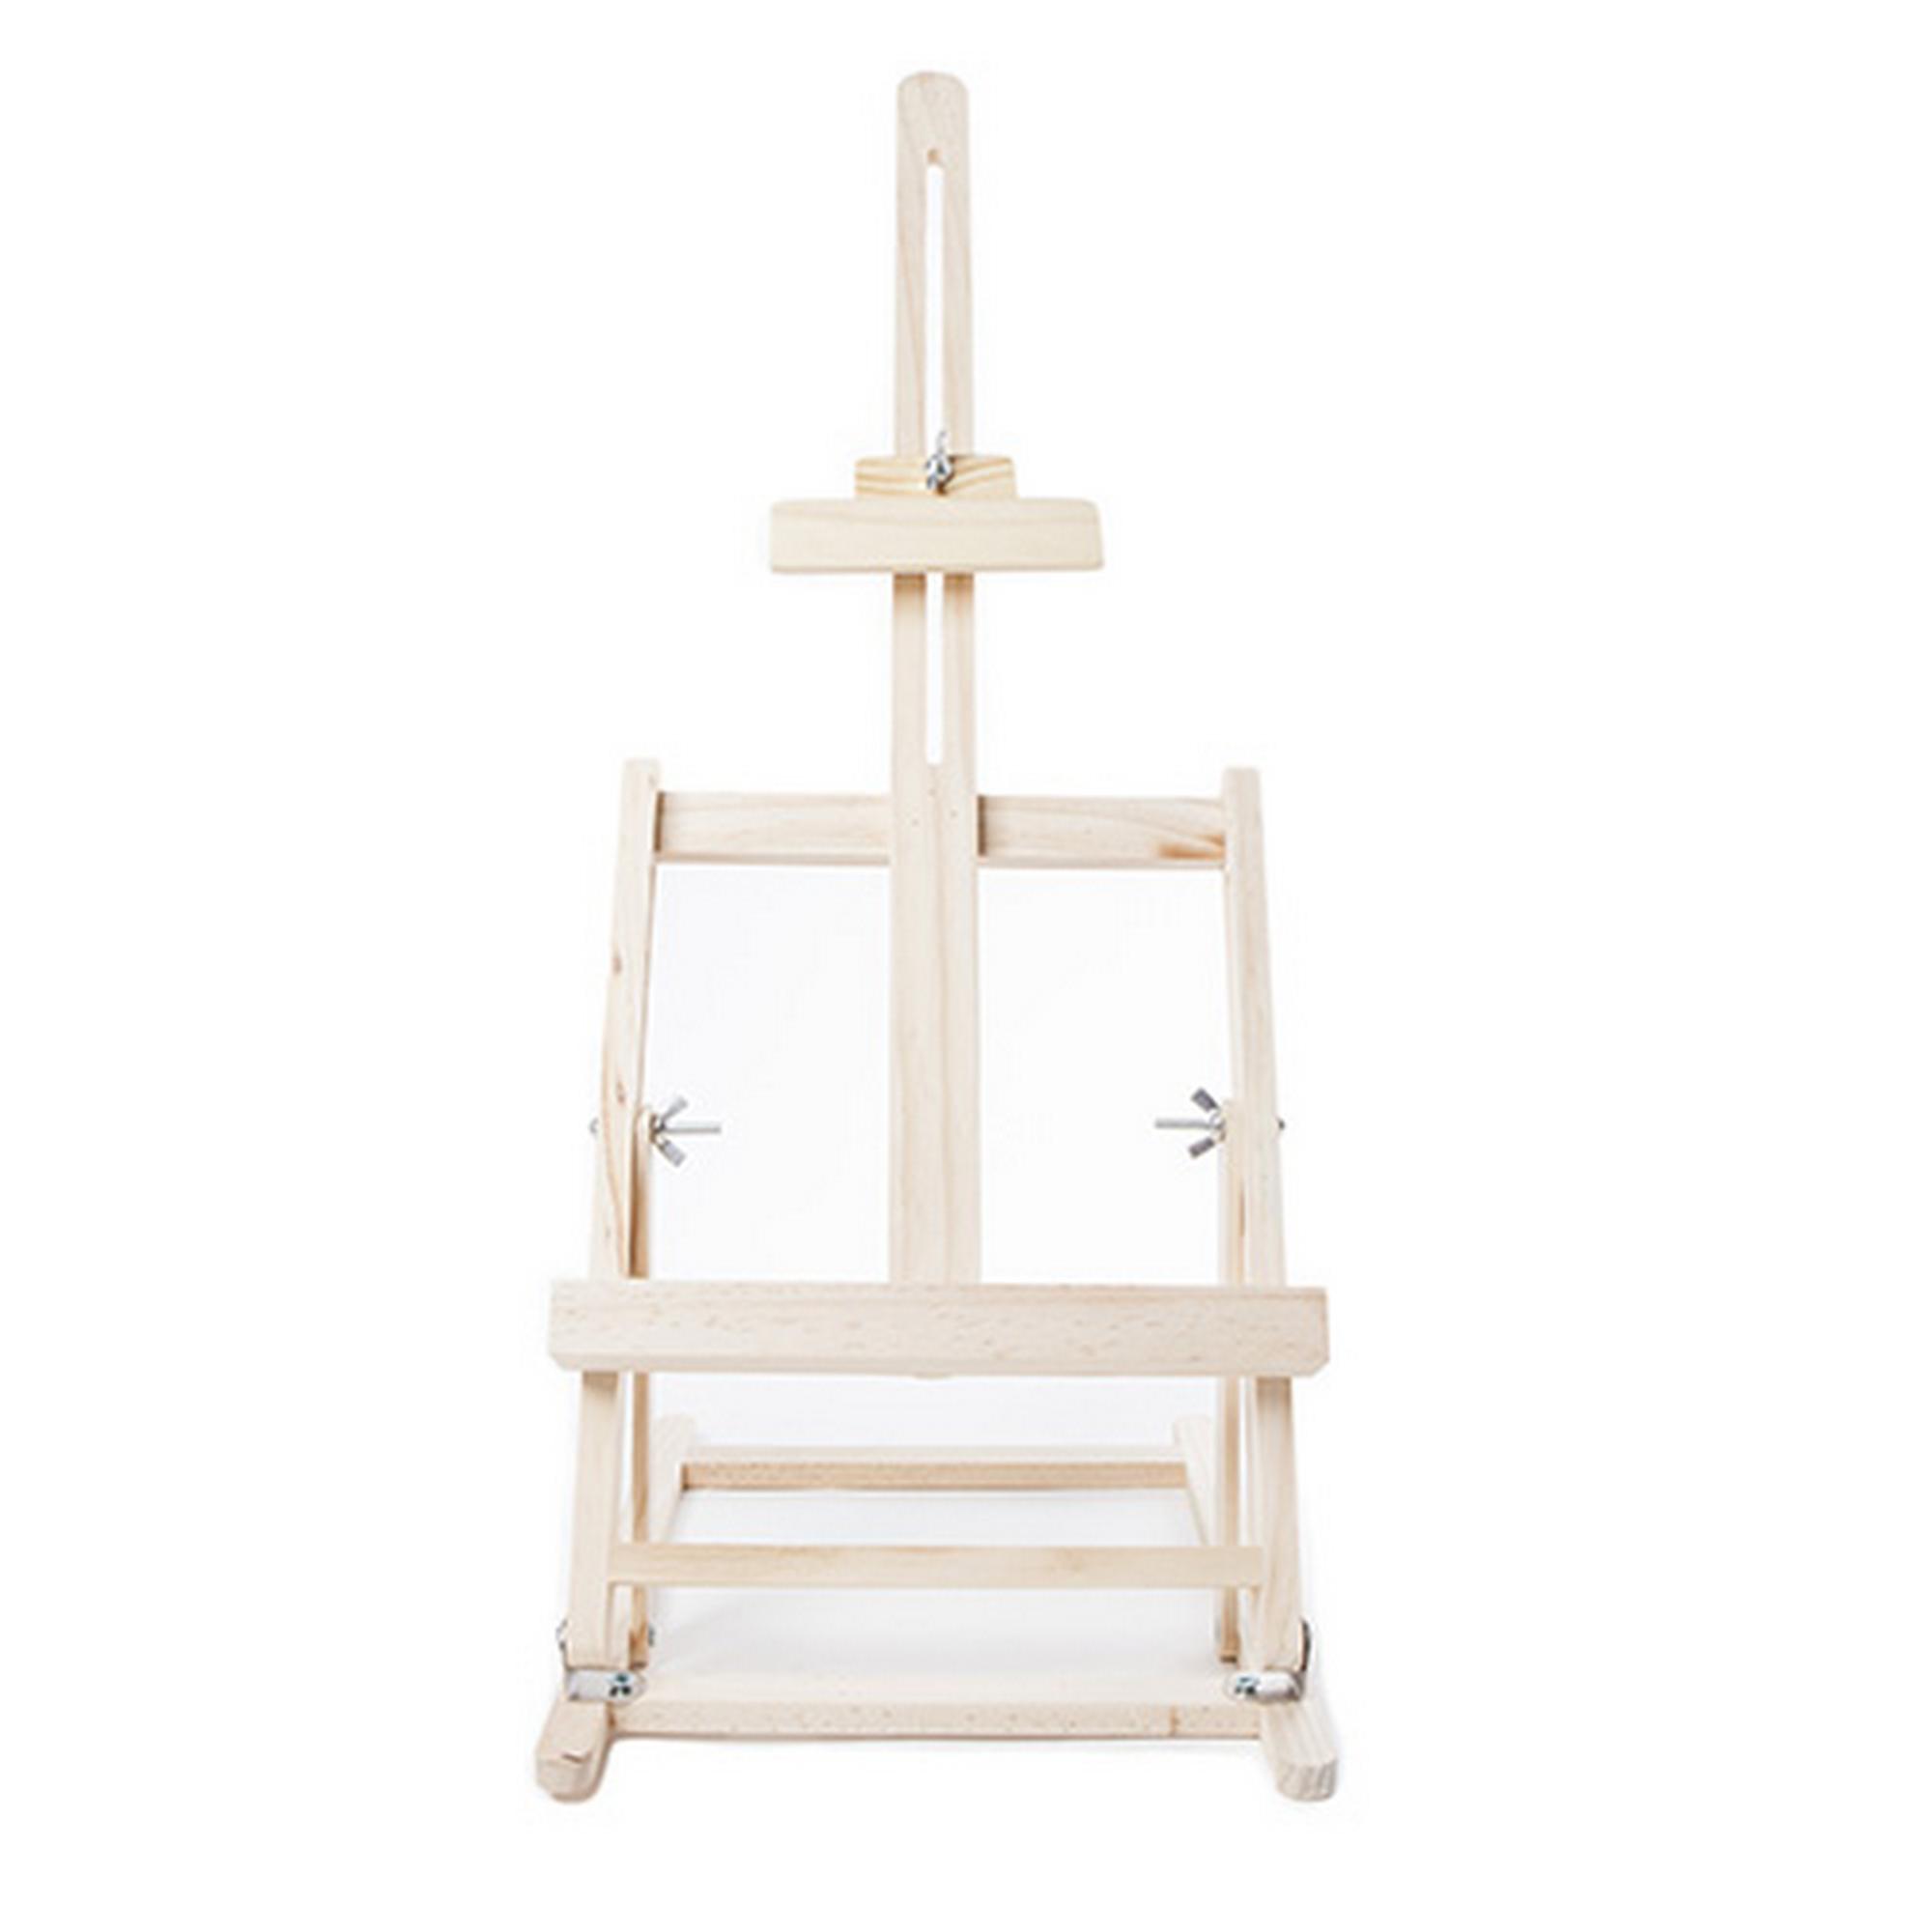 Pine Adjustable Desk Table Top Easel Wooden Artist Tripod